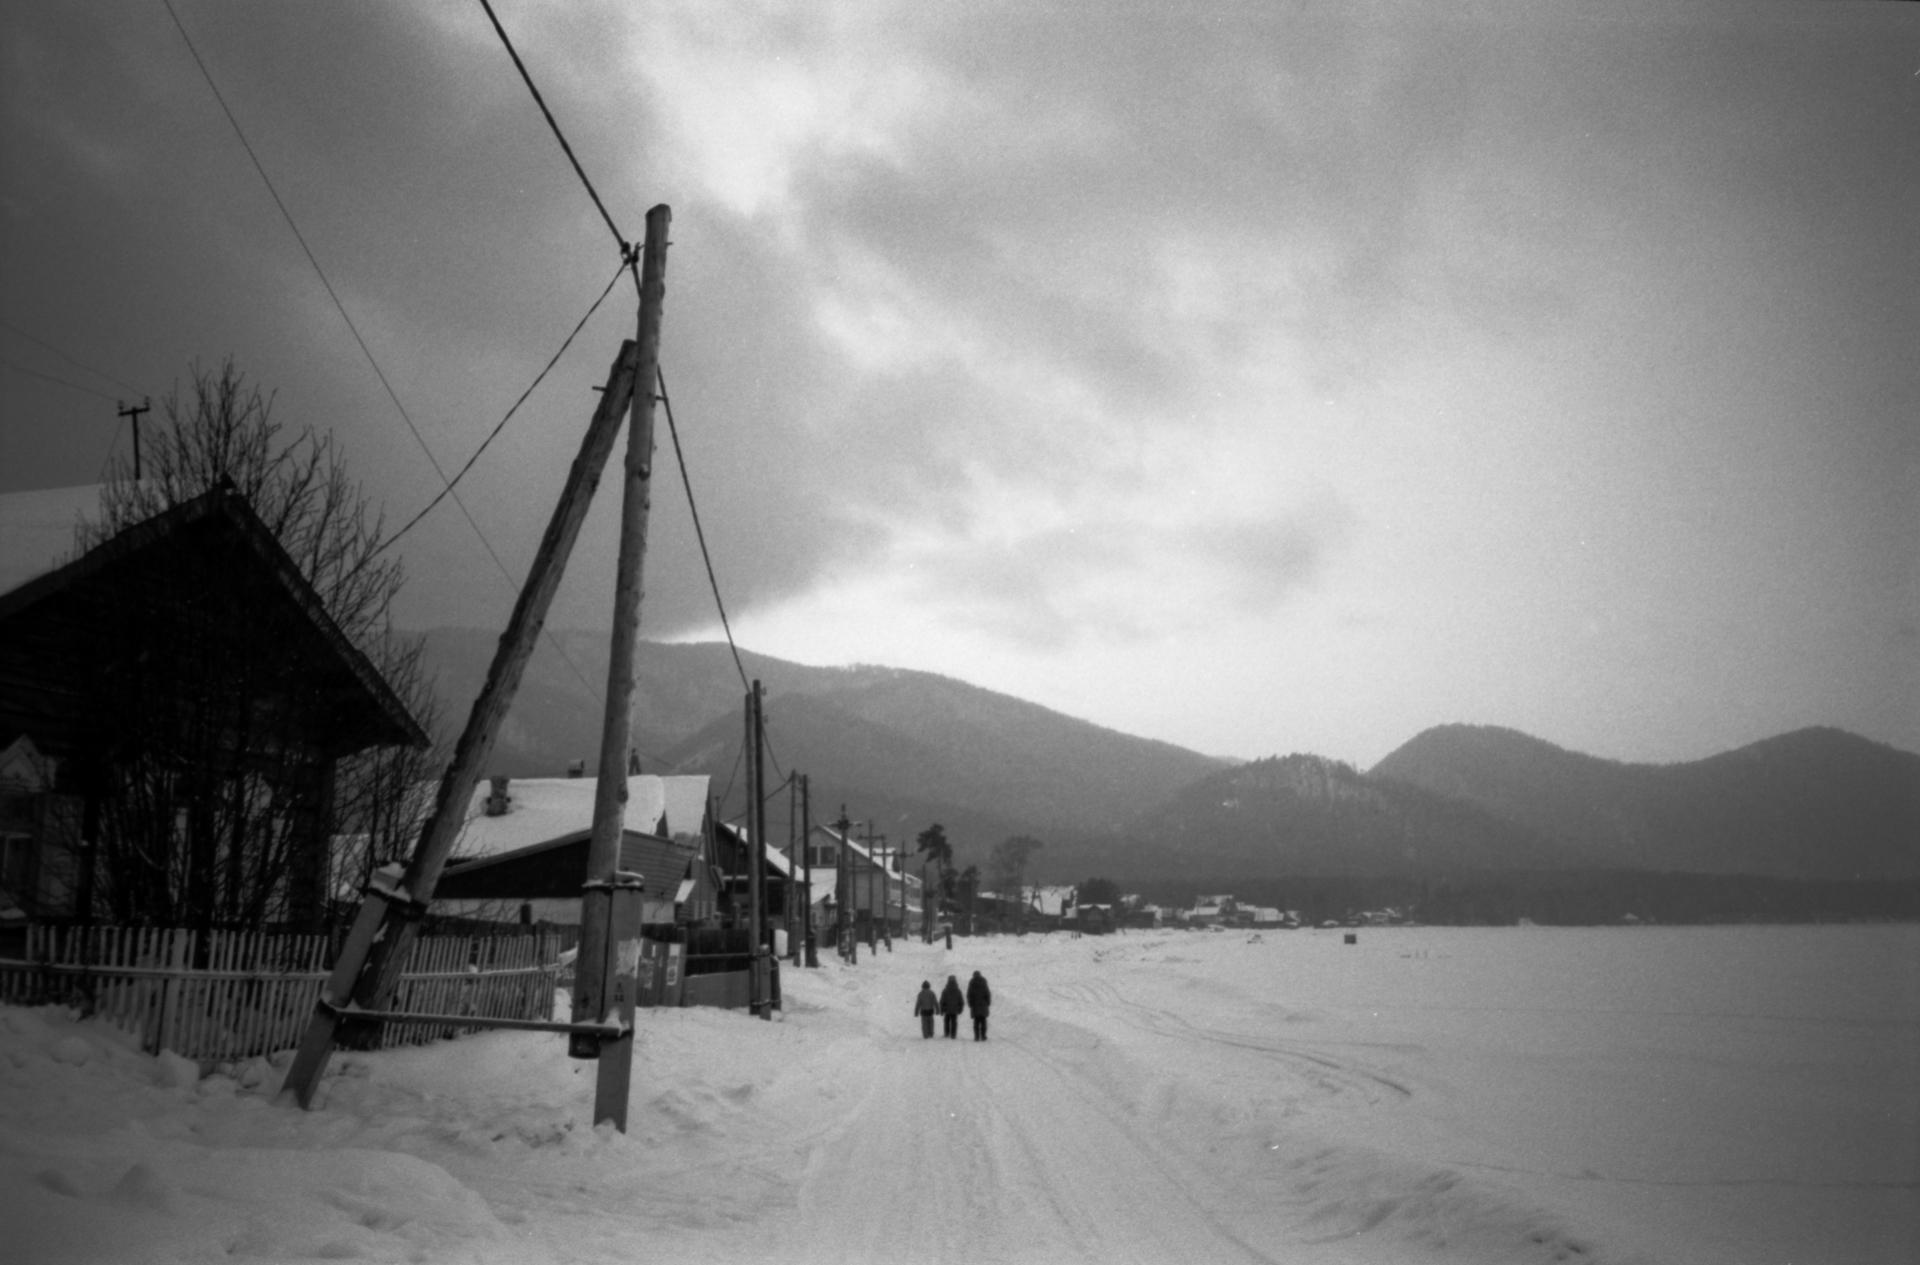 село Максимиха, Байкал